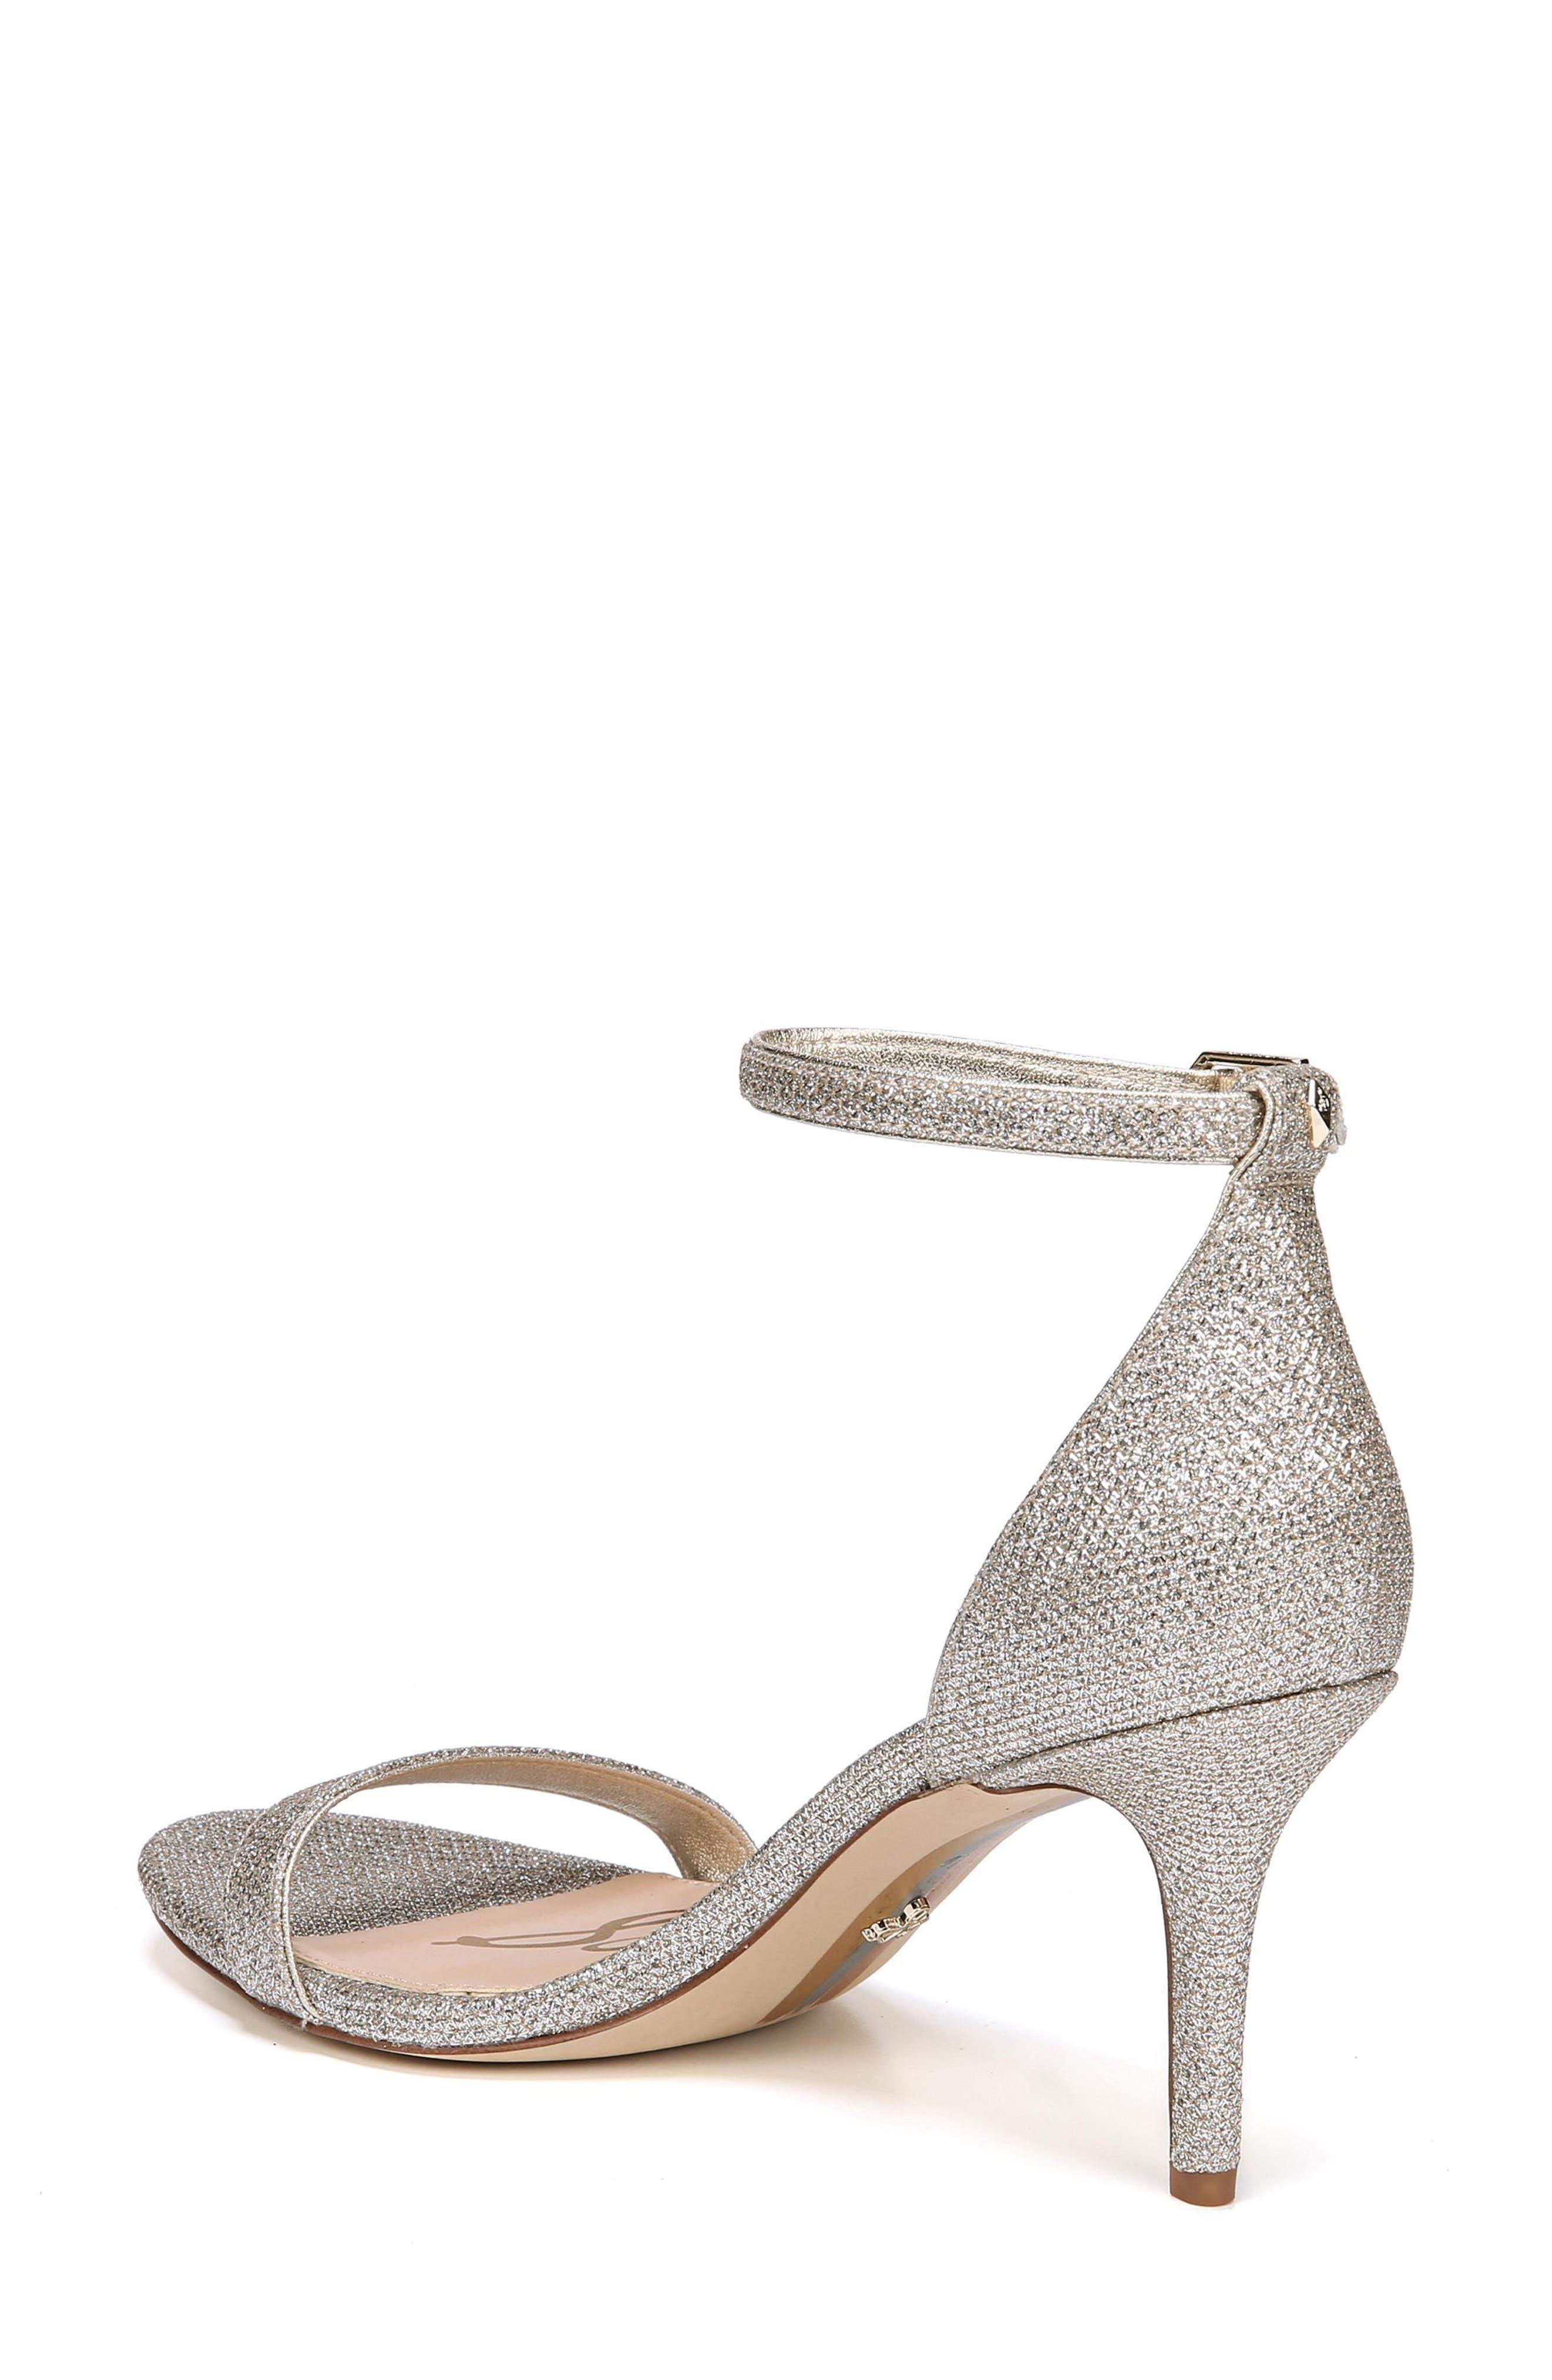 ,                             'Patti' Ankle Strap Sandal,                             Alternate thumbnail 40, color,                             042